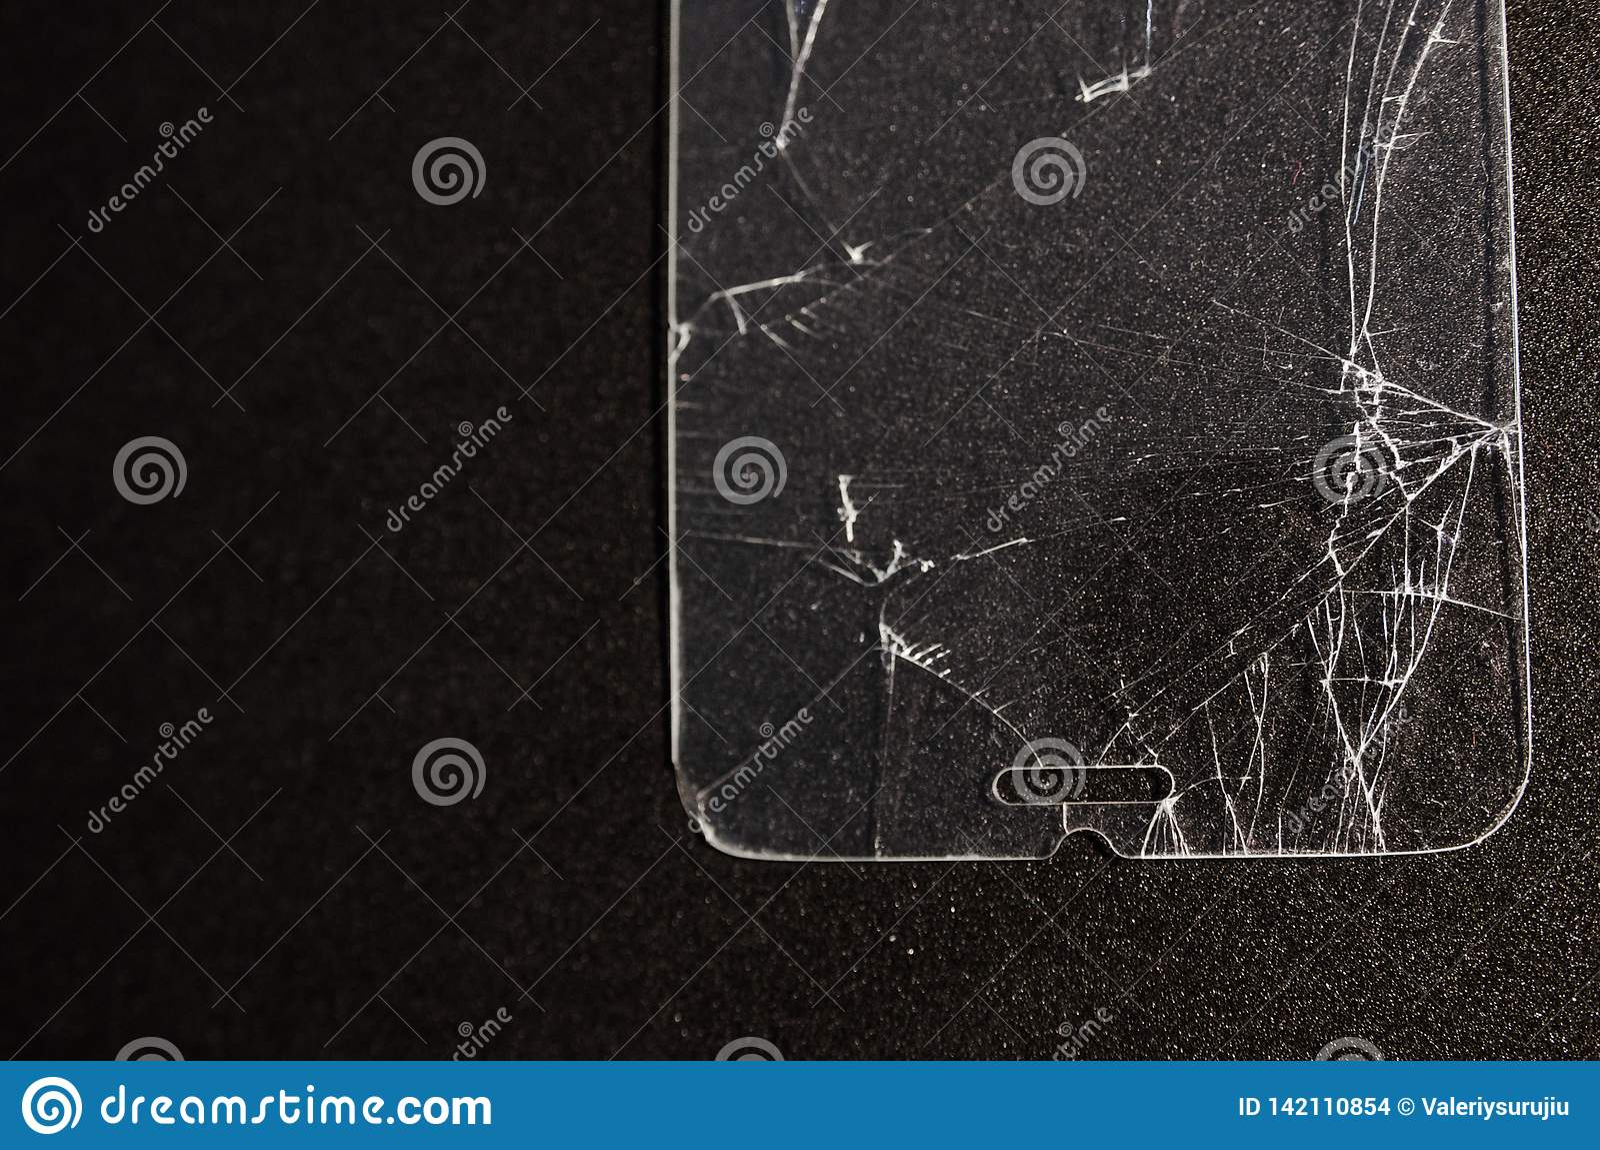 super cute 6e9d8 75136 Broken screen of a phone stock photo. Image of communication - 142110854